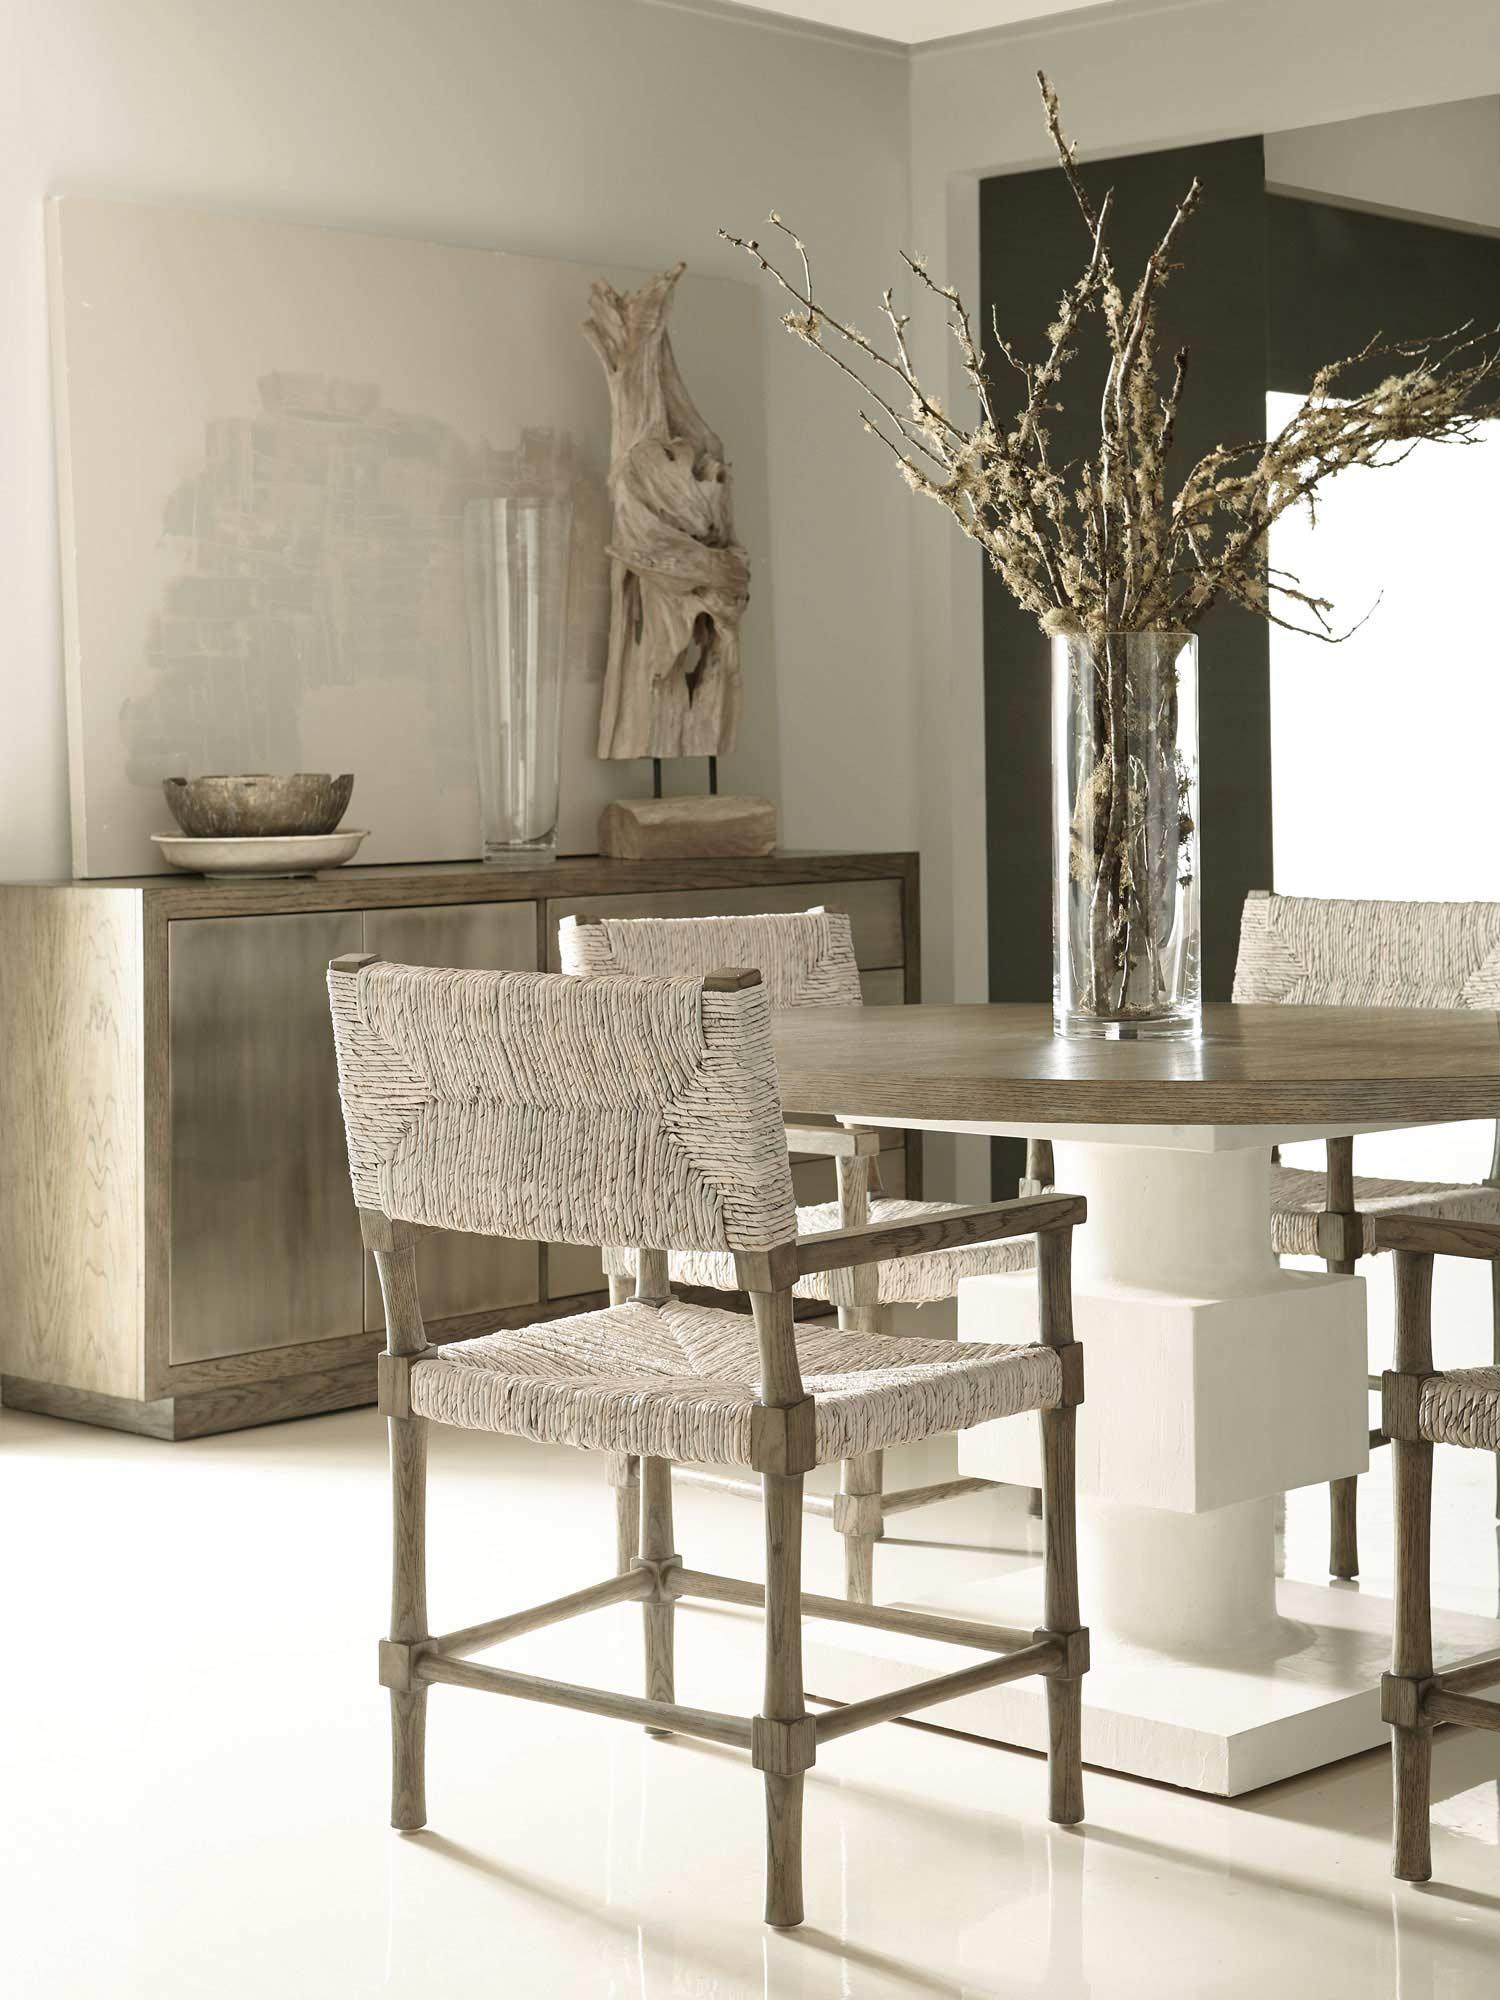 Newberry_Wood_Plaster_Dining_Table_setting2_Bernhardt.jpg